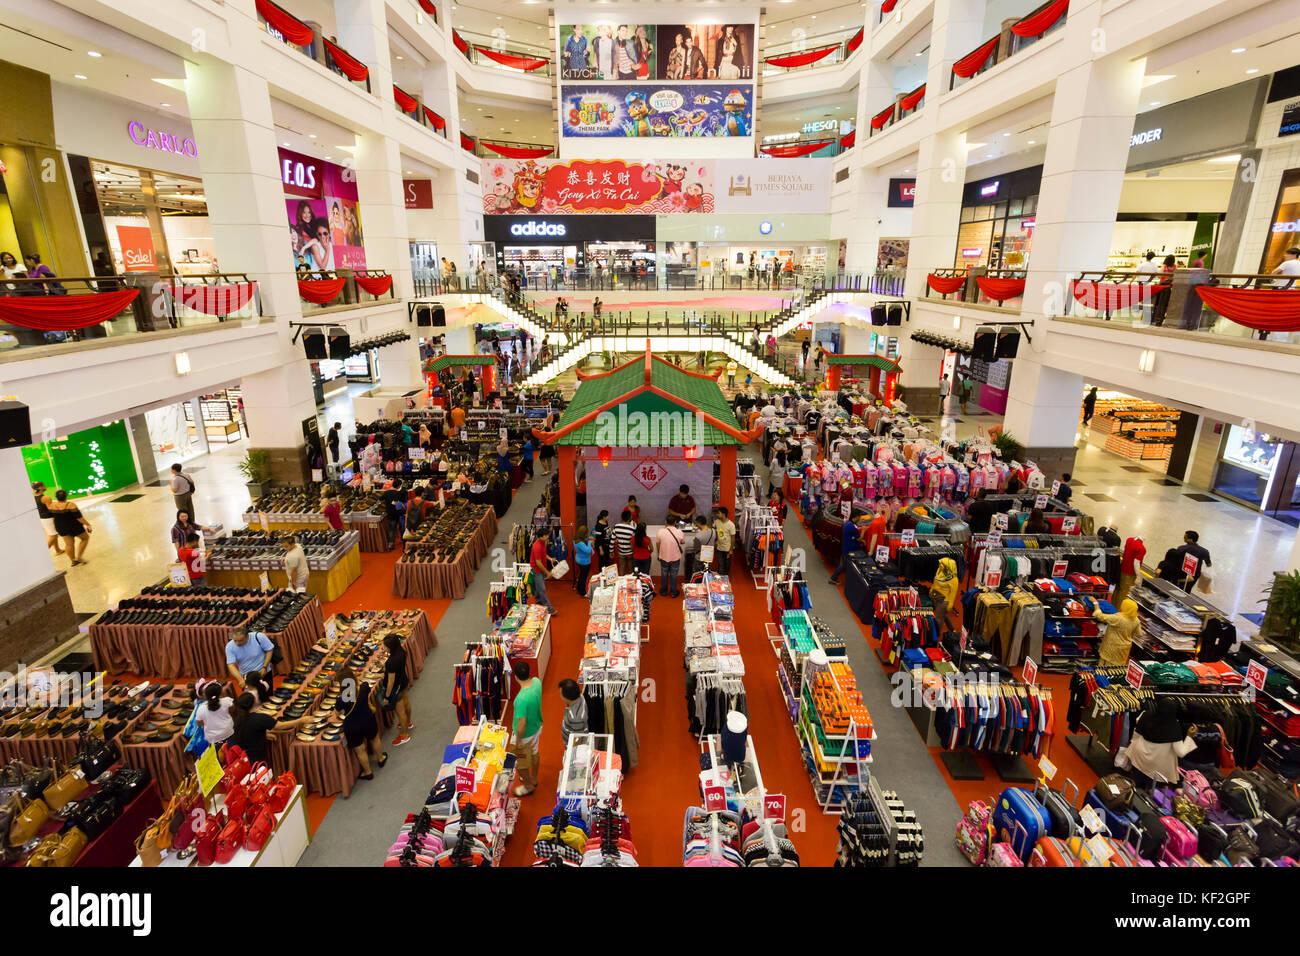 Interior of Berjaya Times Square shopping mall in Bukit Bintang, Kuala Lumpur, Malaysia. - Stock Image